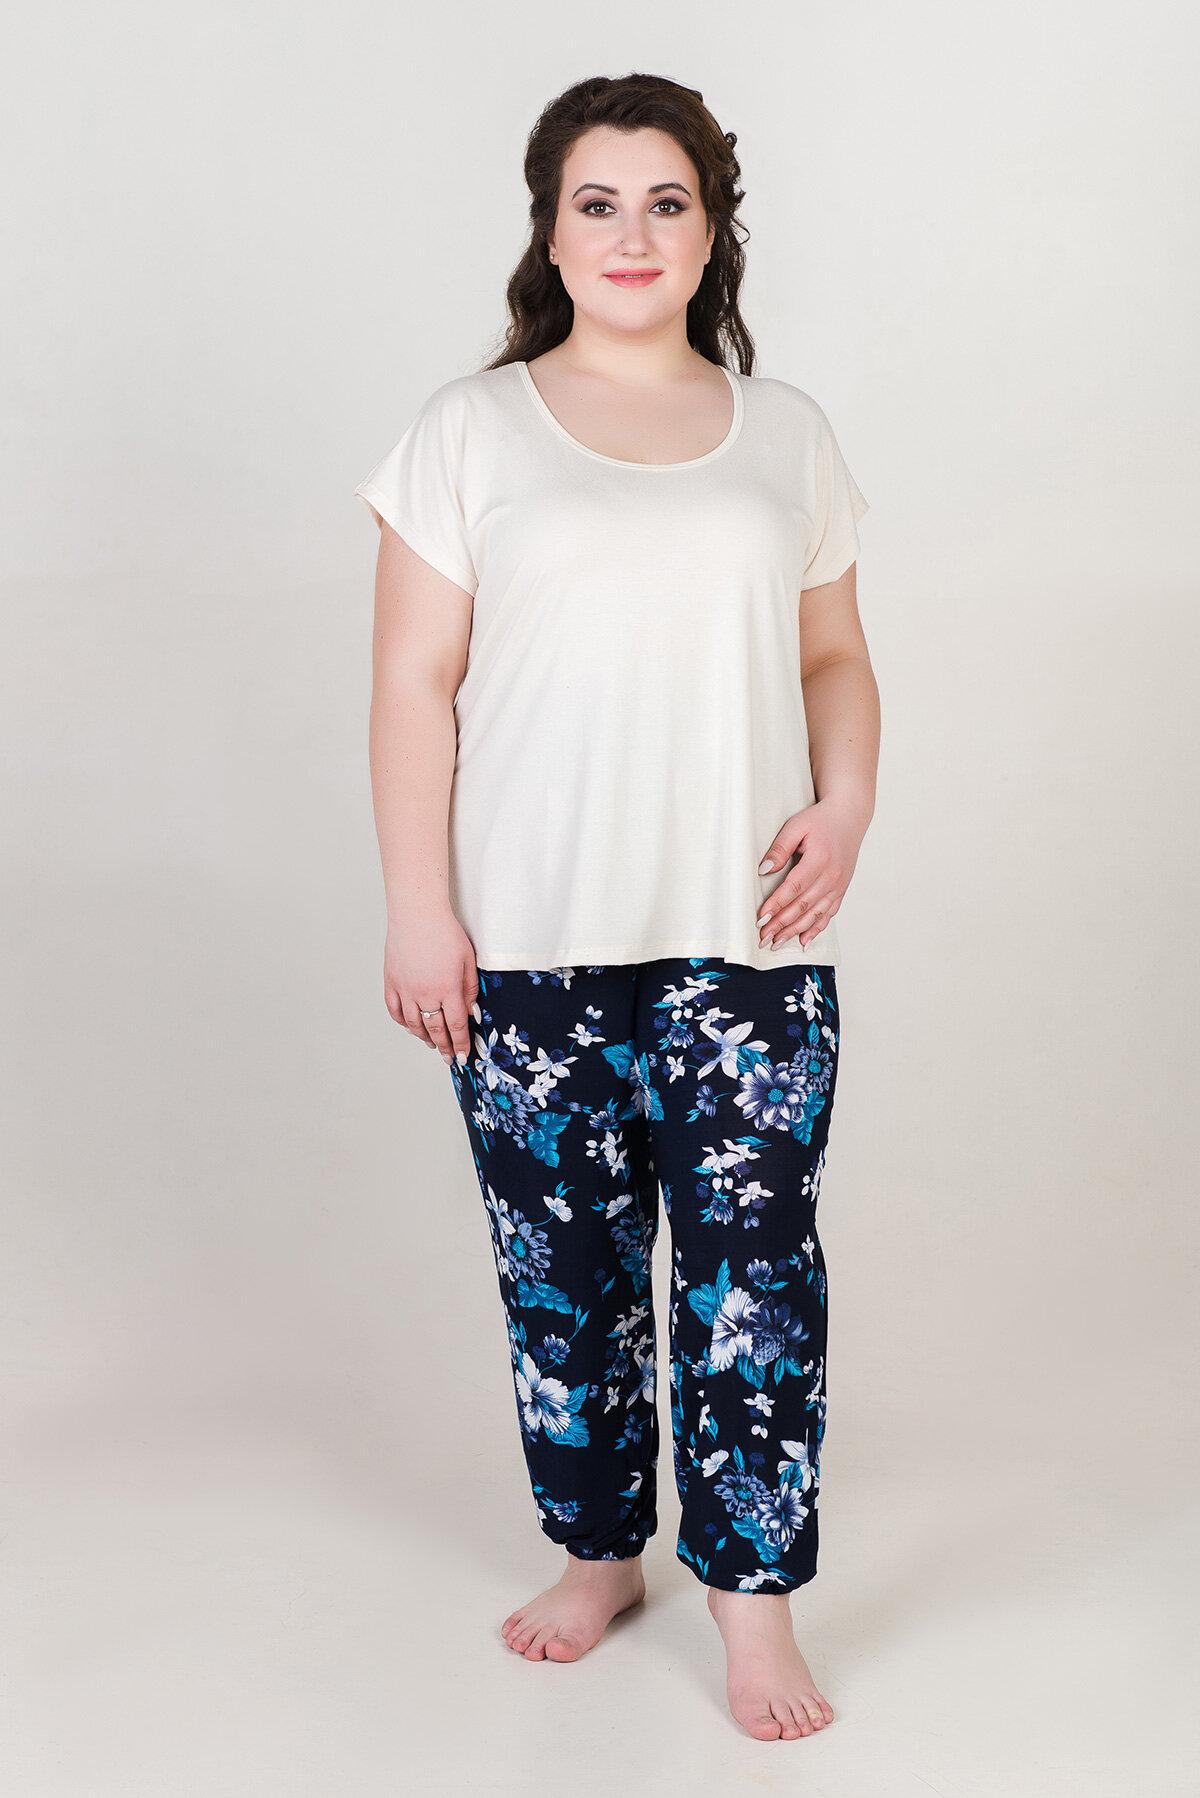 Жен. брюки Шарлиз арт. 19-0092 Сирень размер 46 Масло